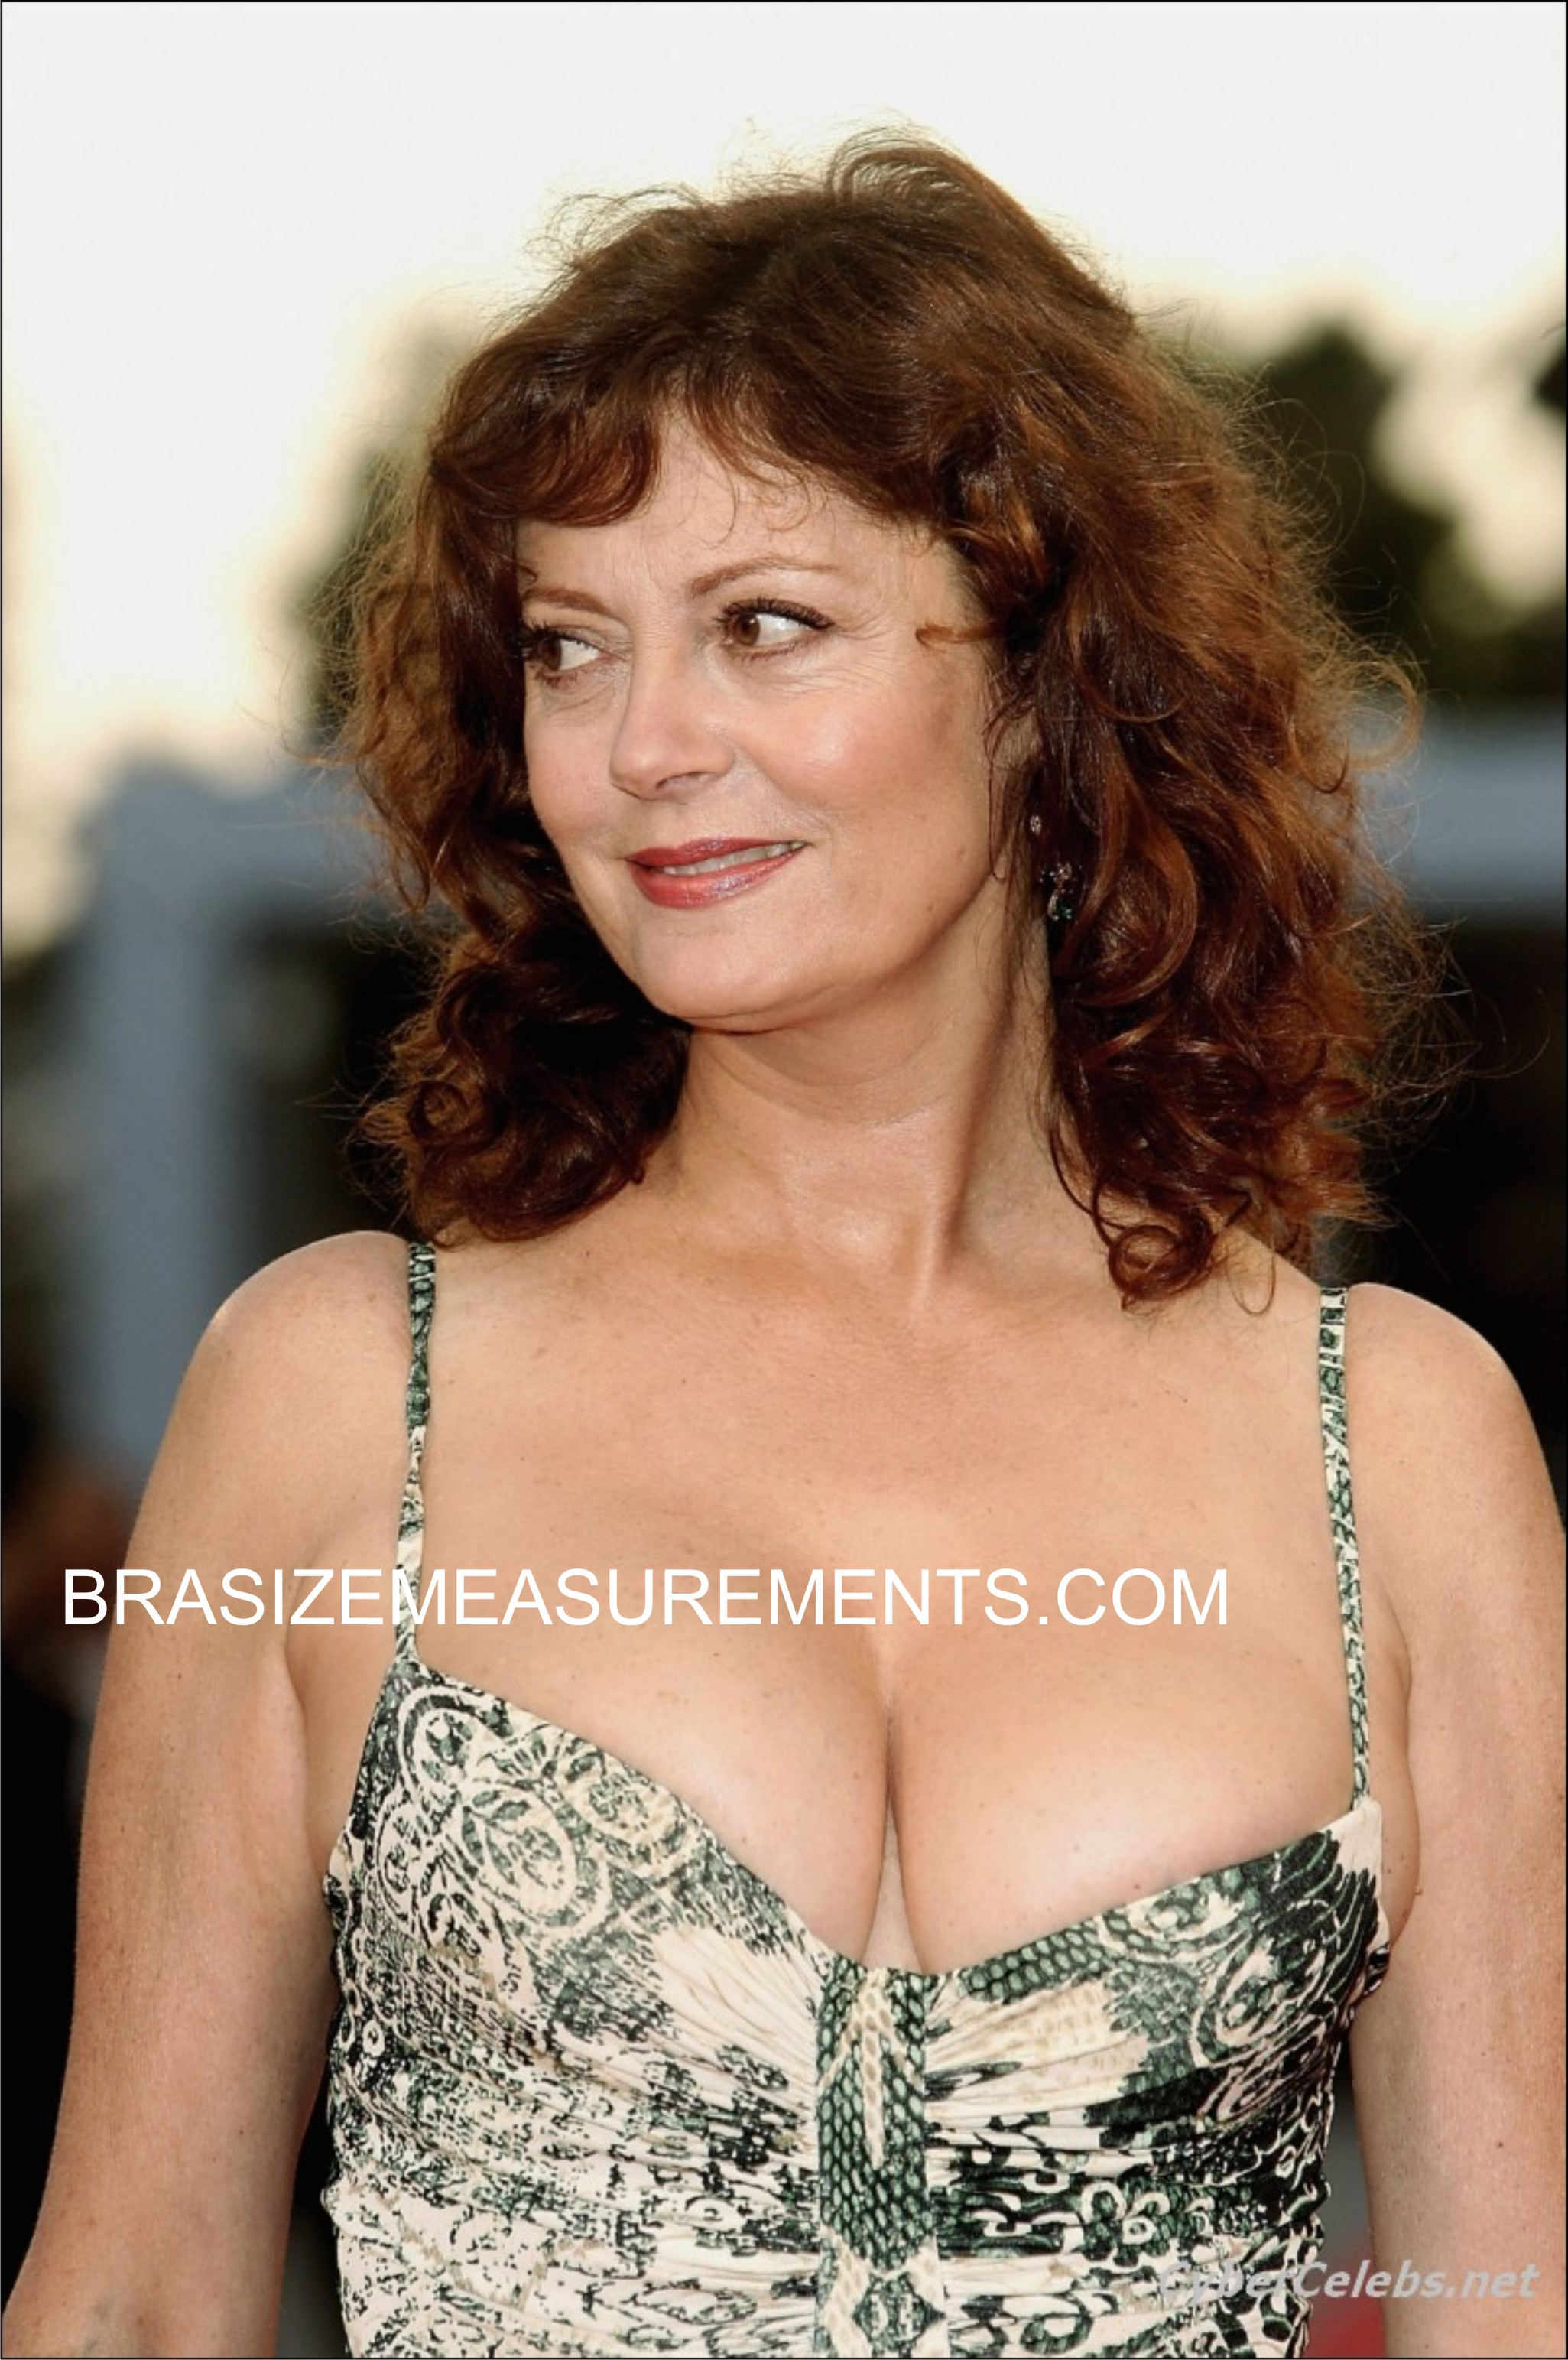 Susan Sarandon Bra Size